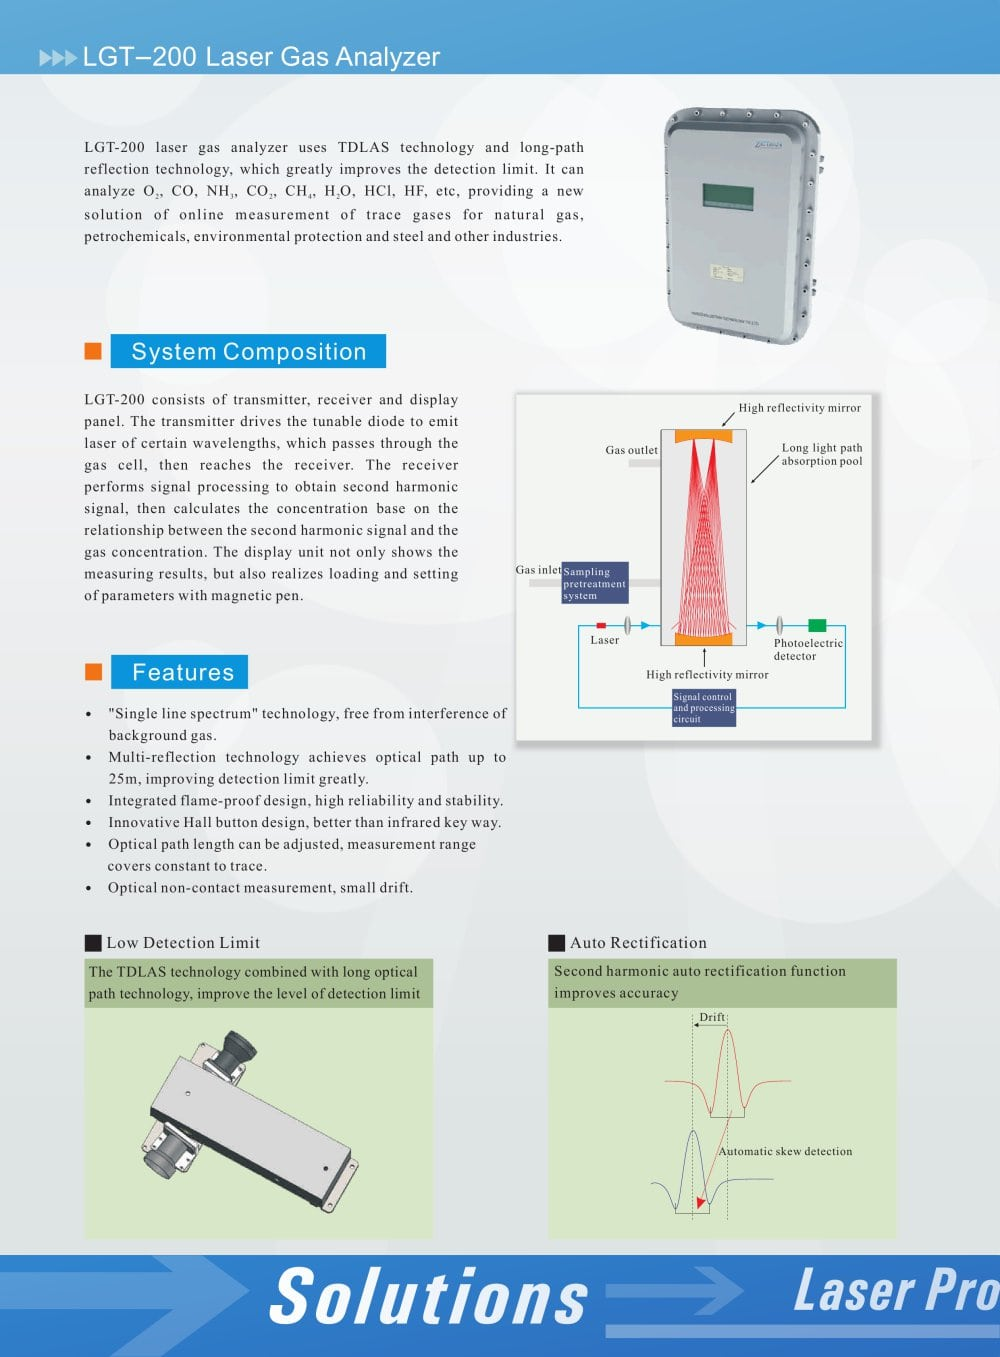 model tdlas 5100 wiring diagram schematics wiring diagrams u2022 rh parntesis co 3 Phase Transformer Wiring Diagram Simple One Line Electrical Diagram